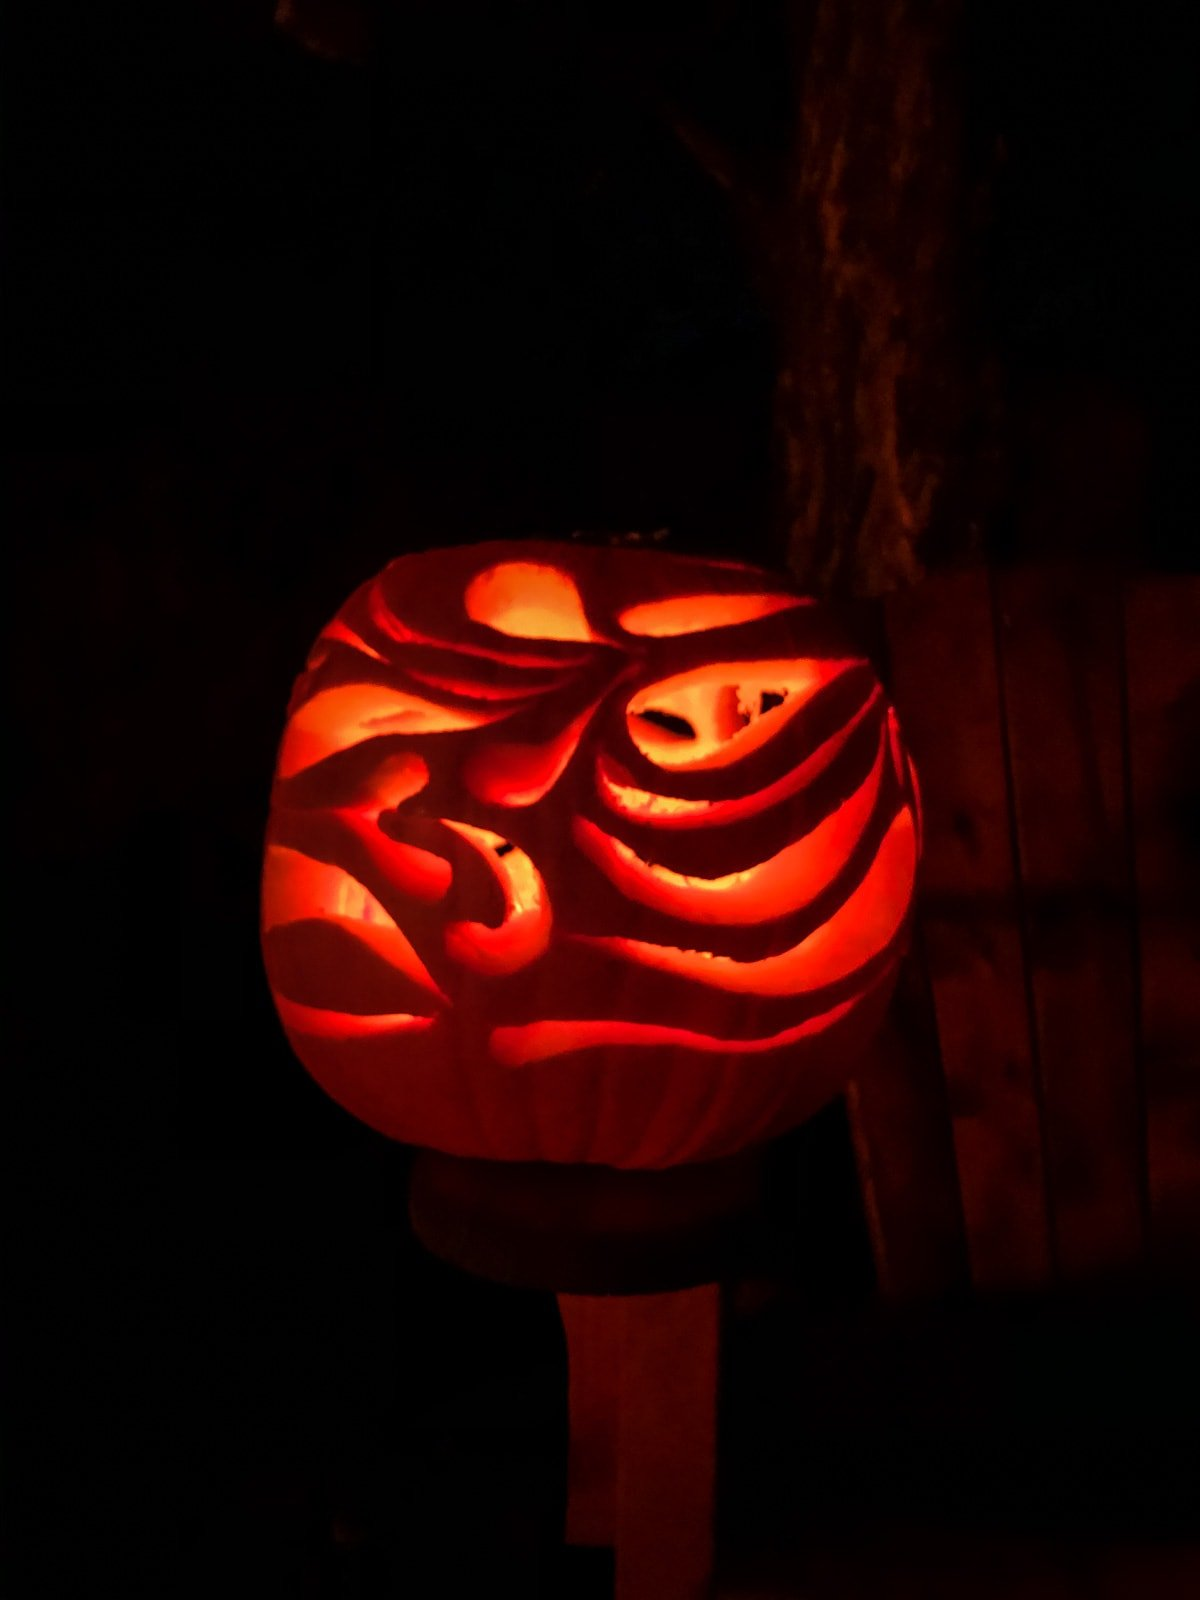 a large orange pumpkin with swirls carved into it. it is lit up orange in a dark black night